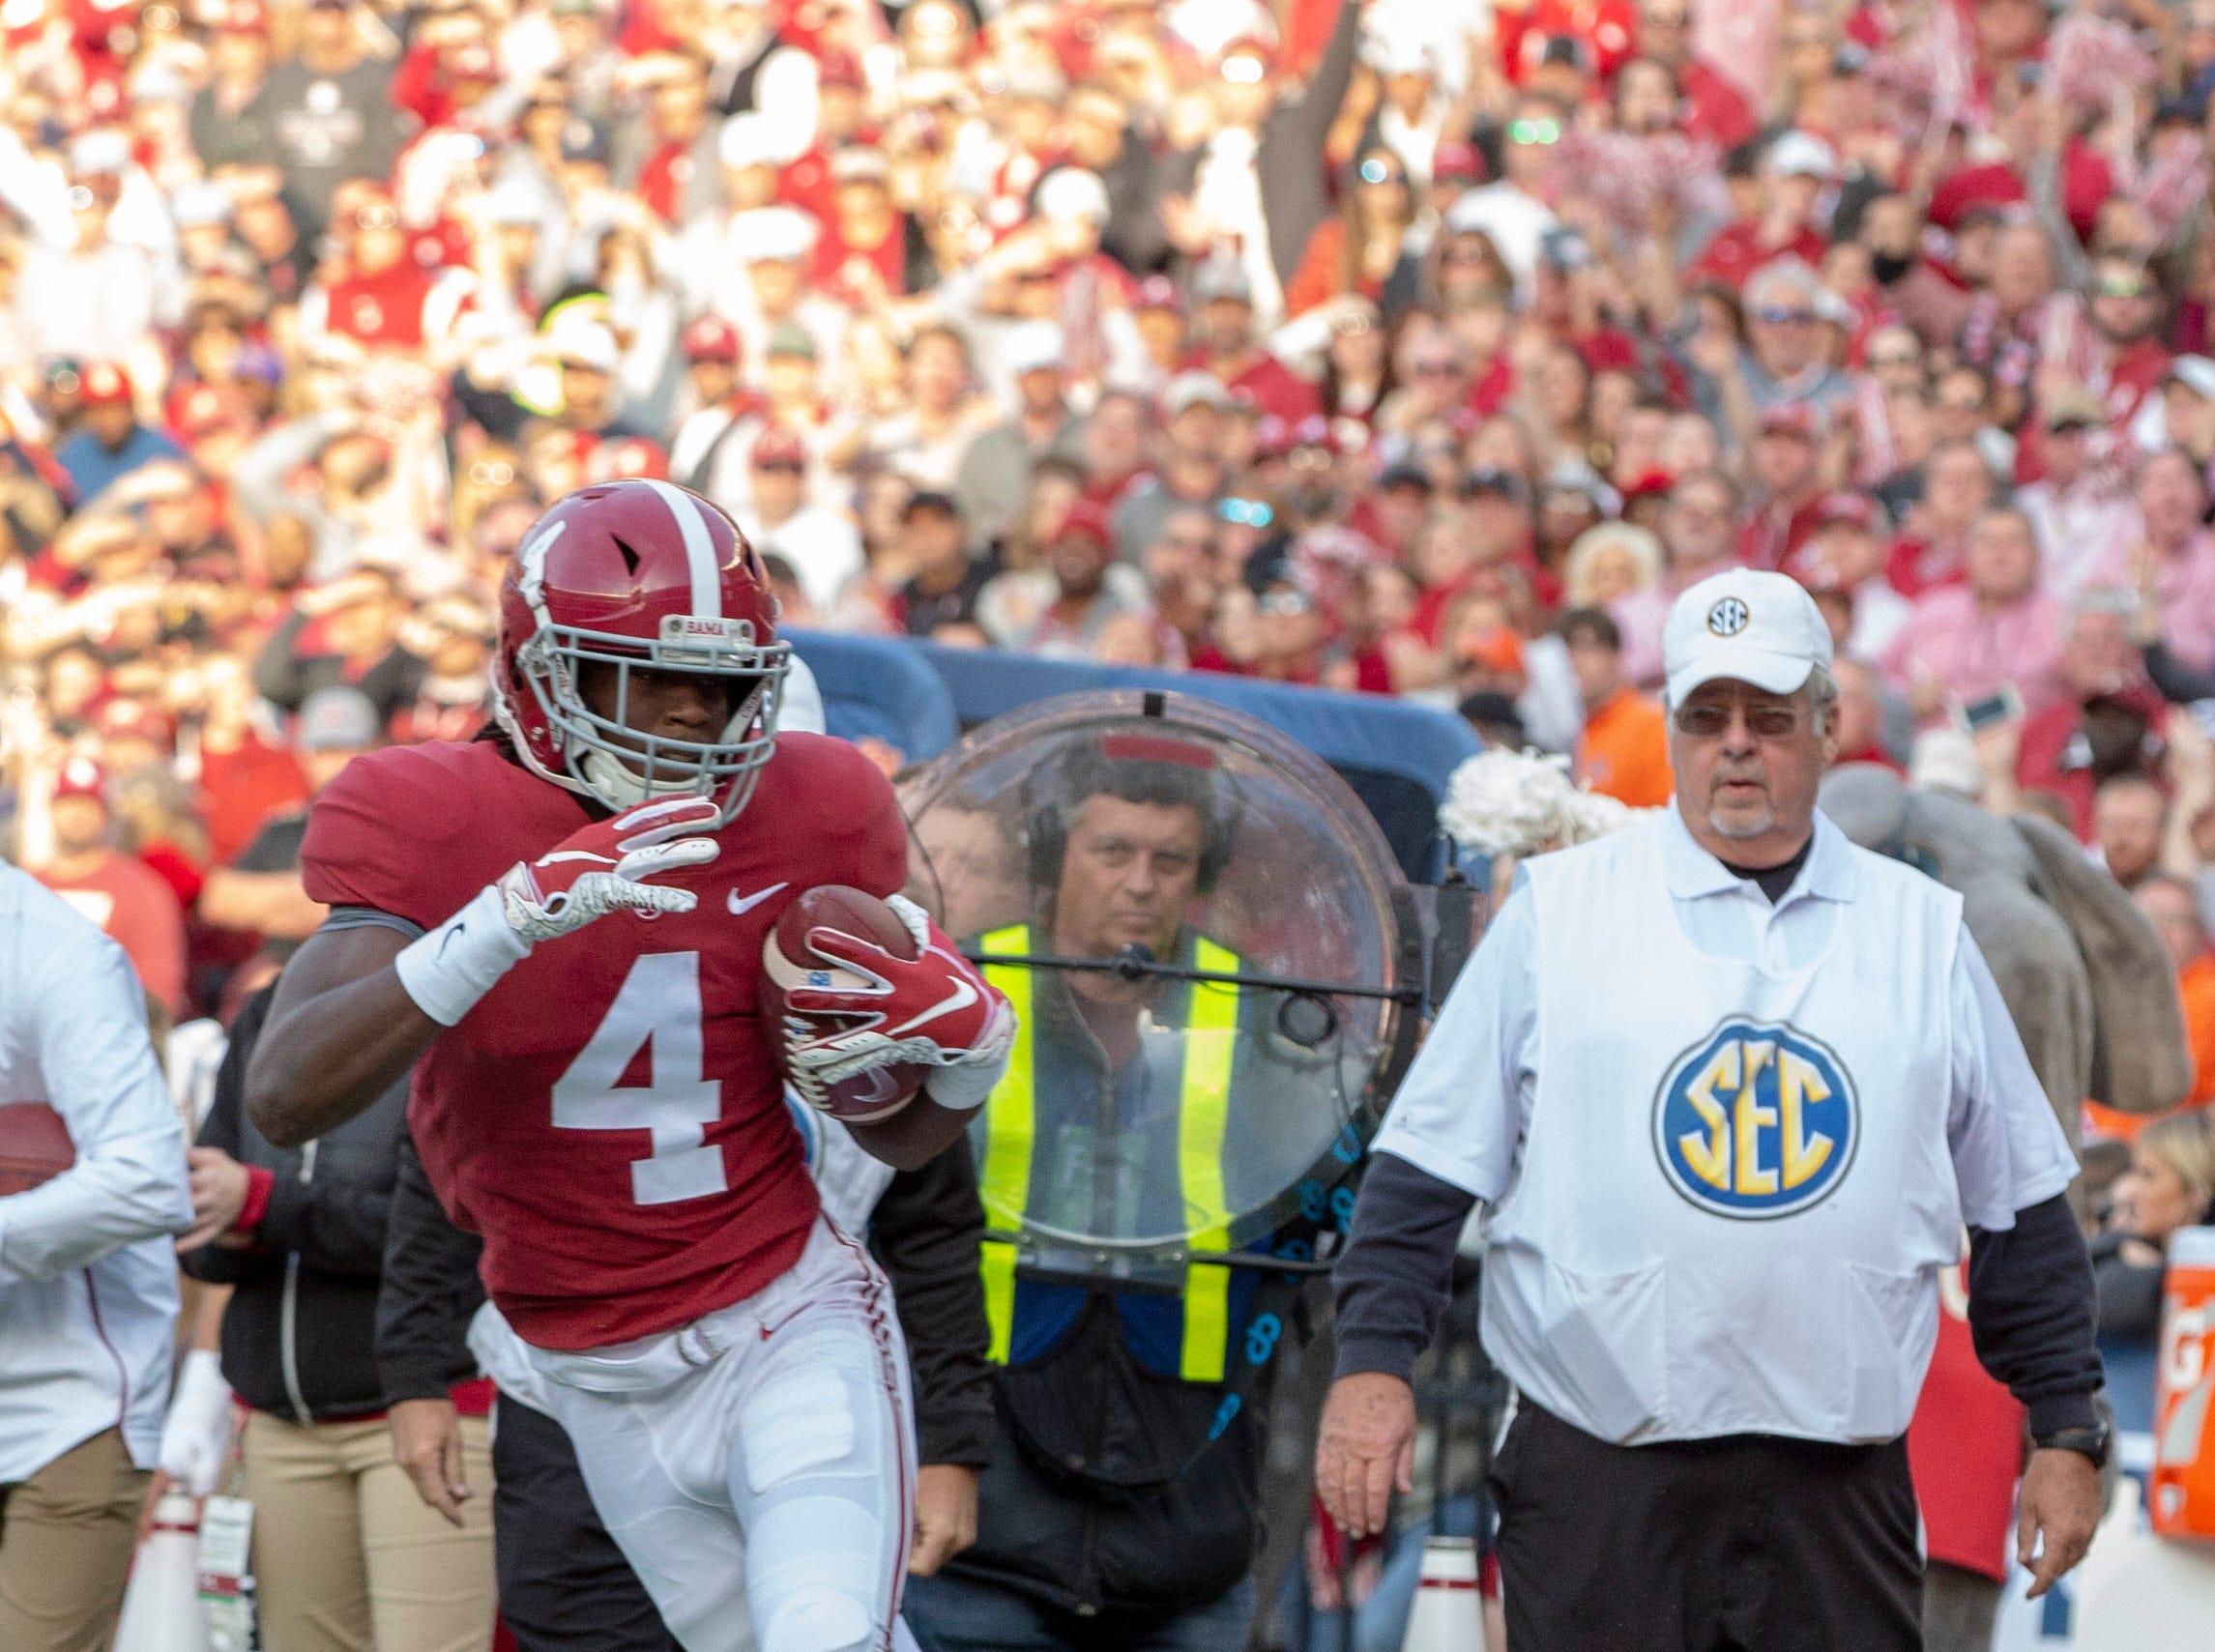 Alabama's Jerry Jeudy runs the ball as Auburn's Javaris Davis tries to take him down for a tackle.